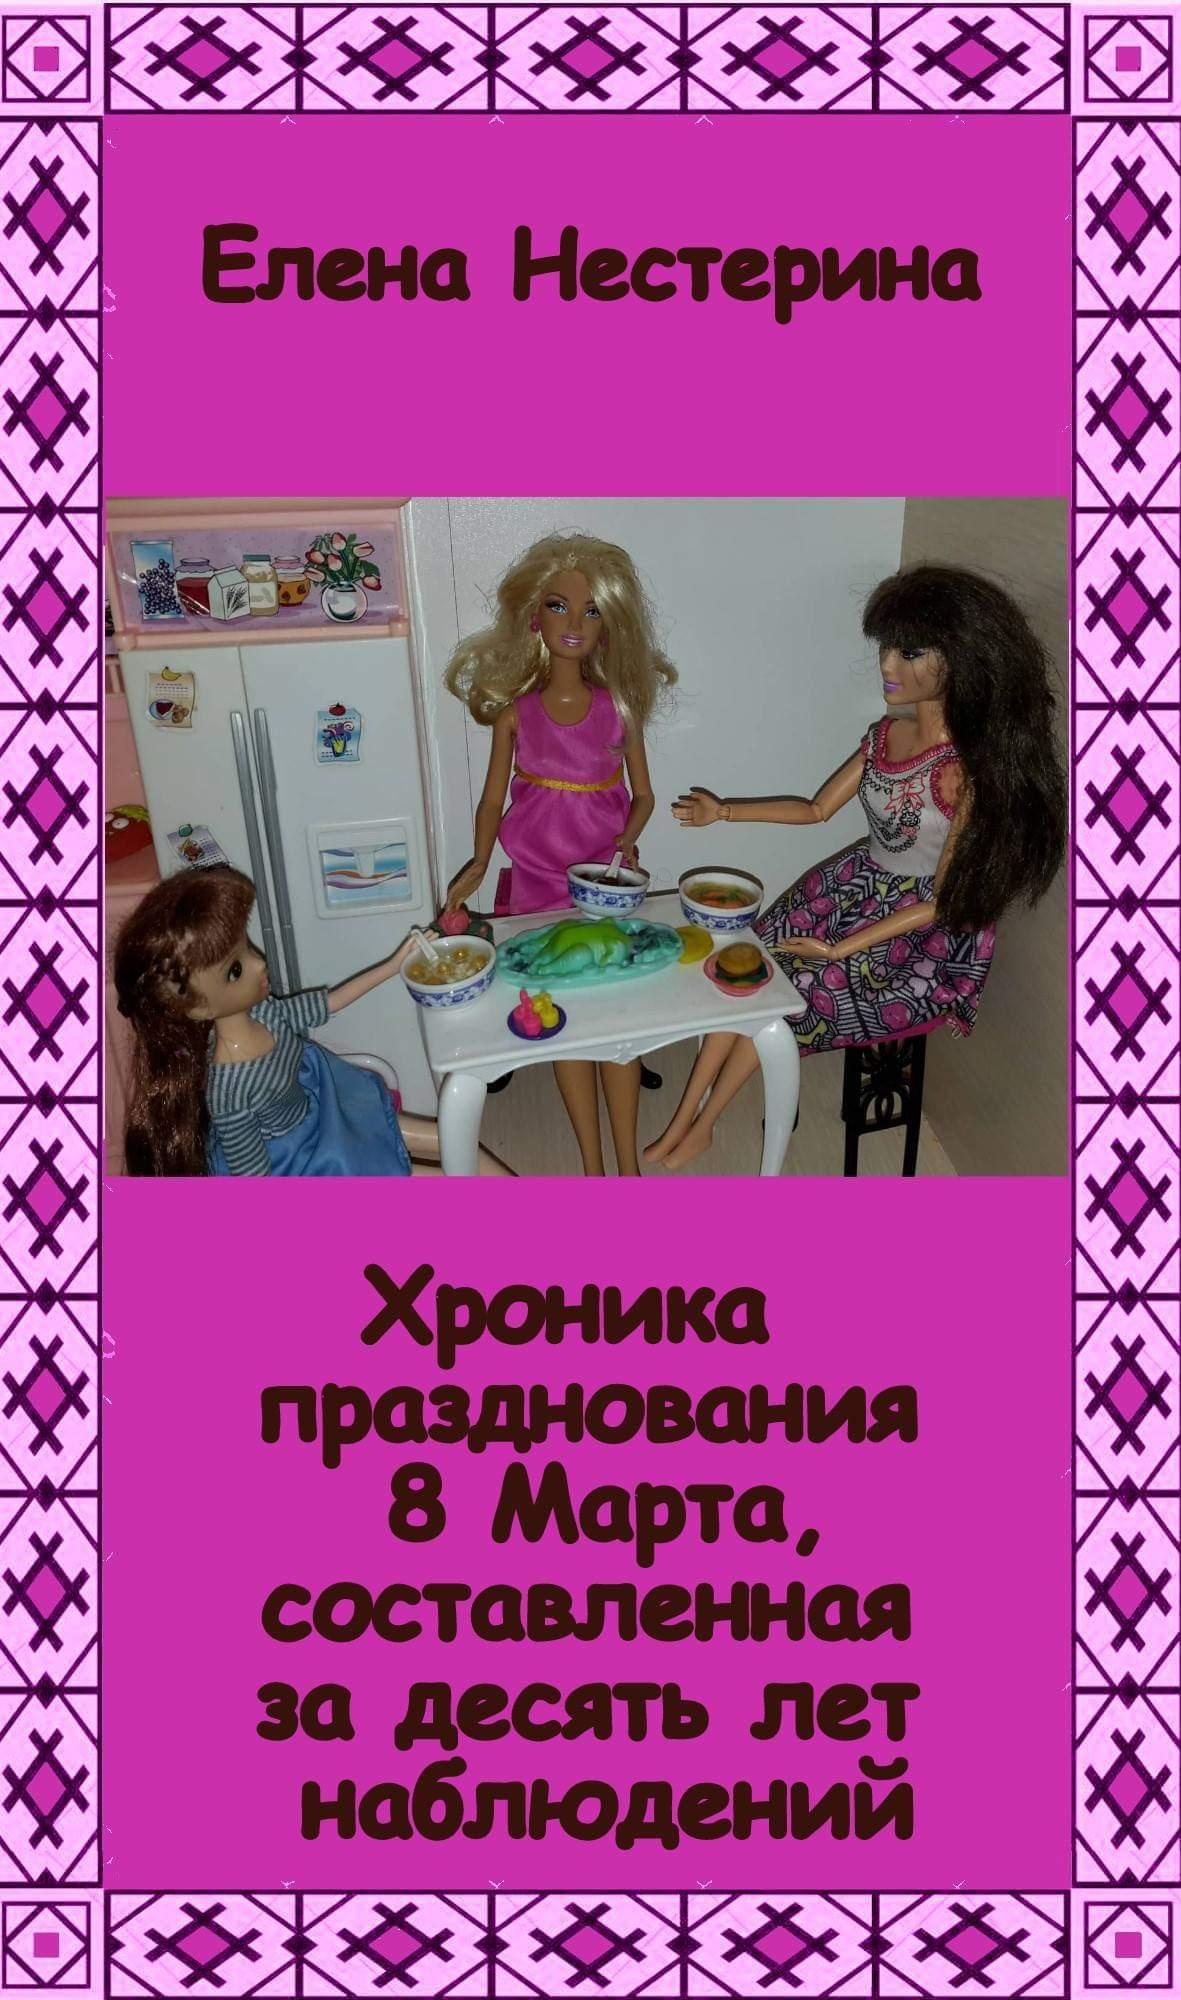 Елена Нестерина Хроника празднования 8 Марта, составленная за десять лет наблюдений картина белка и 8е марта